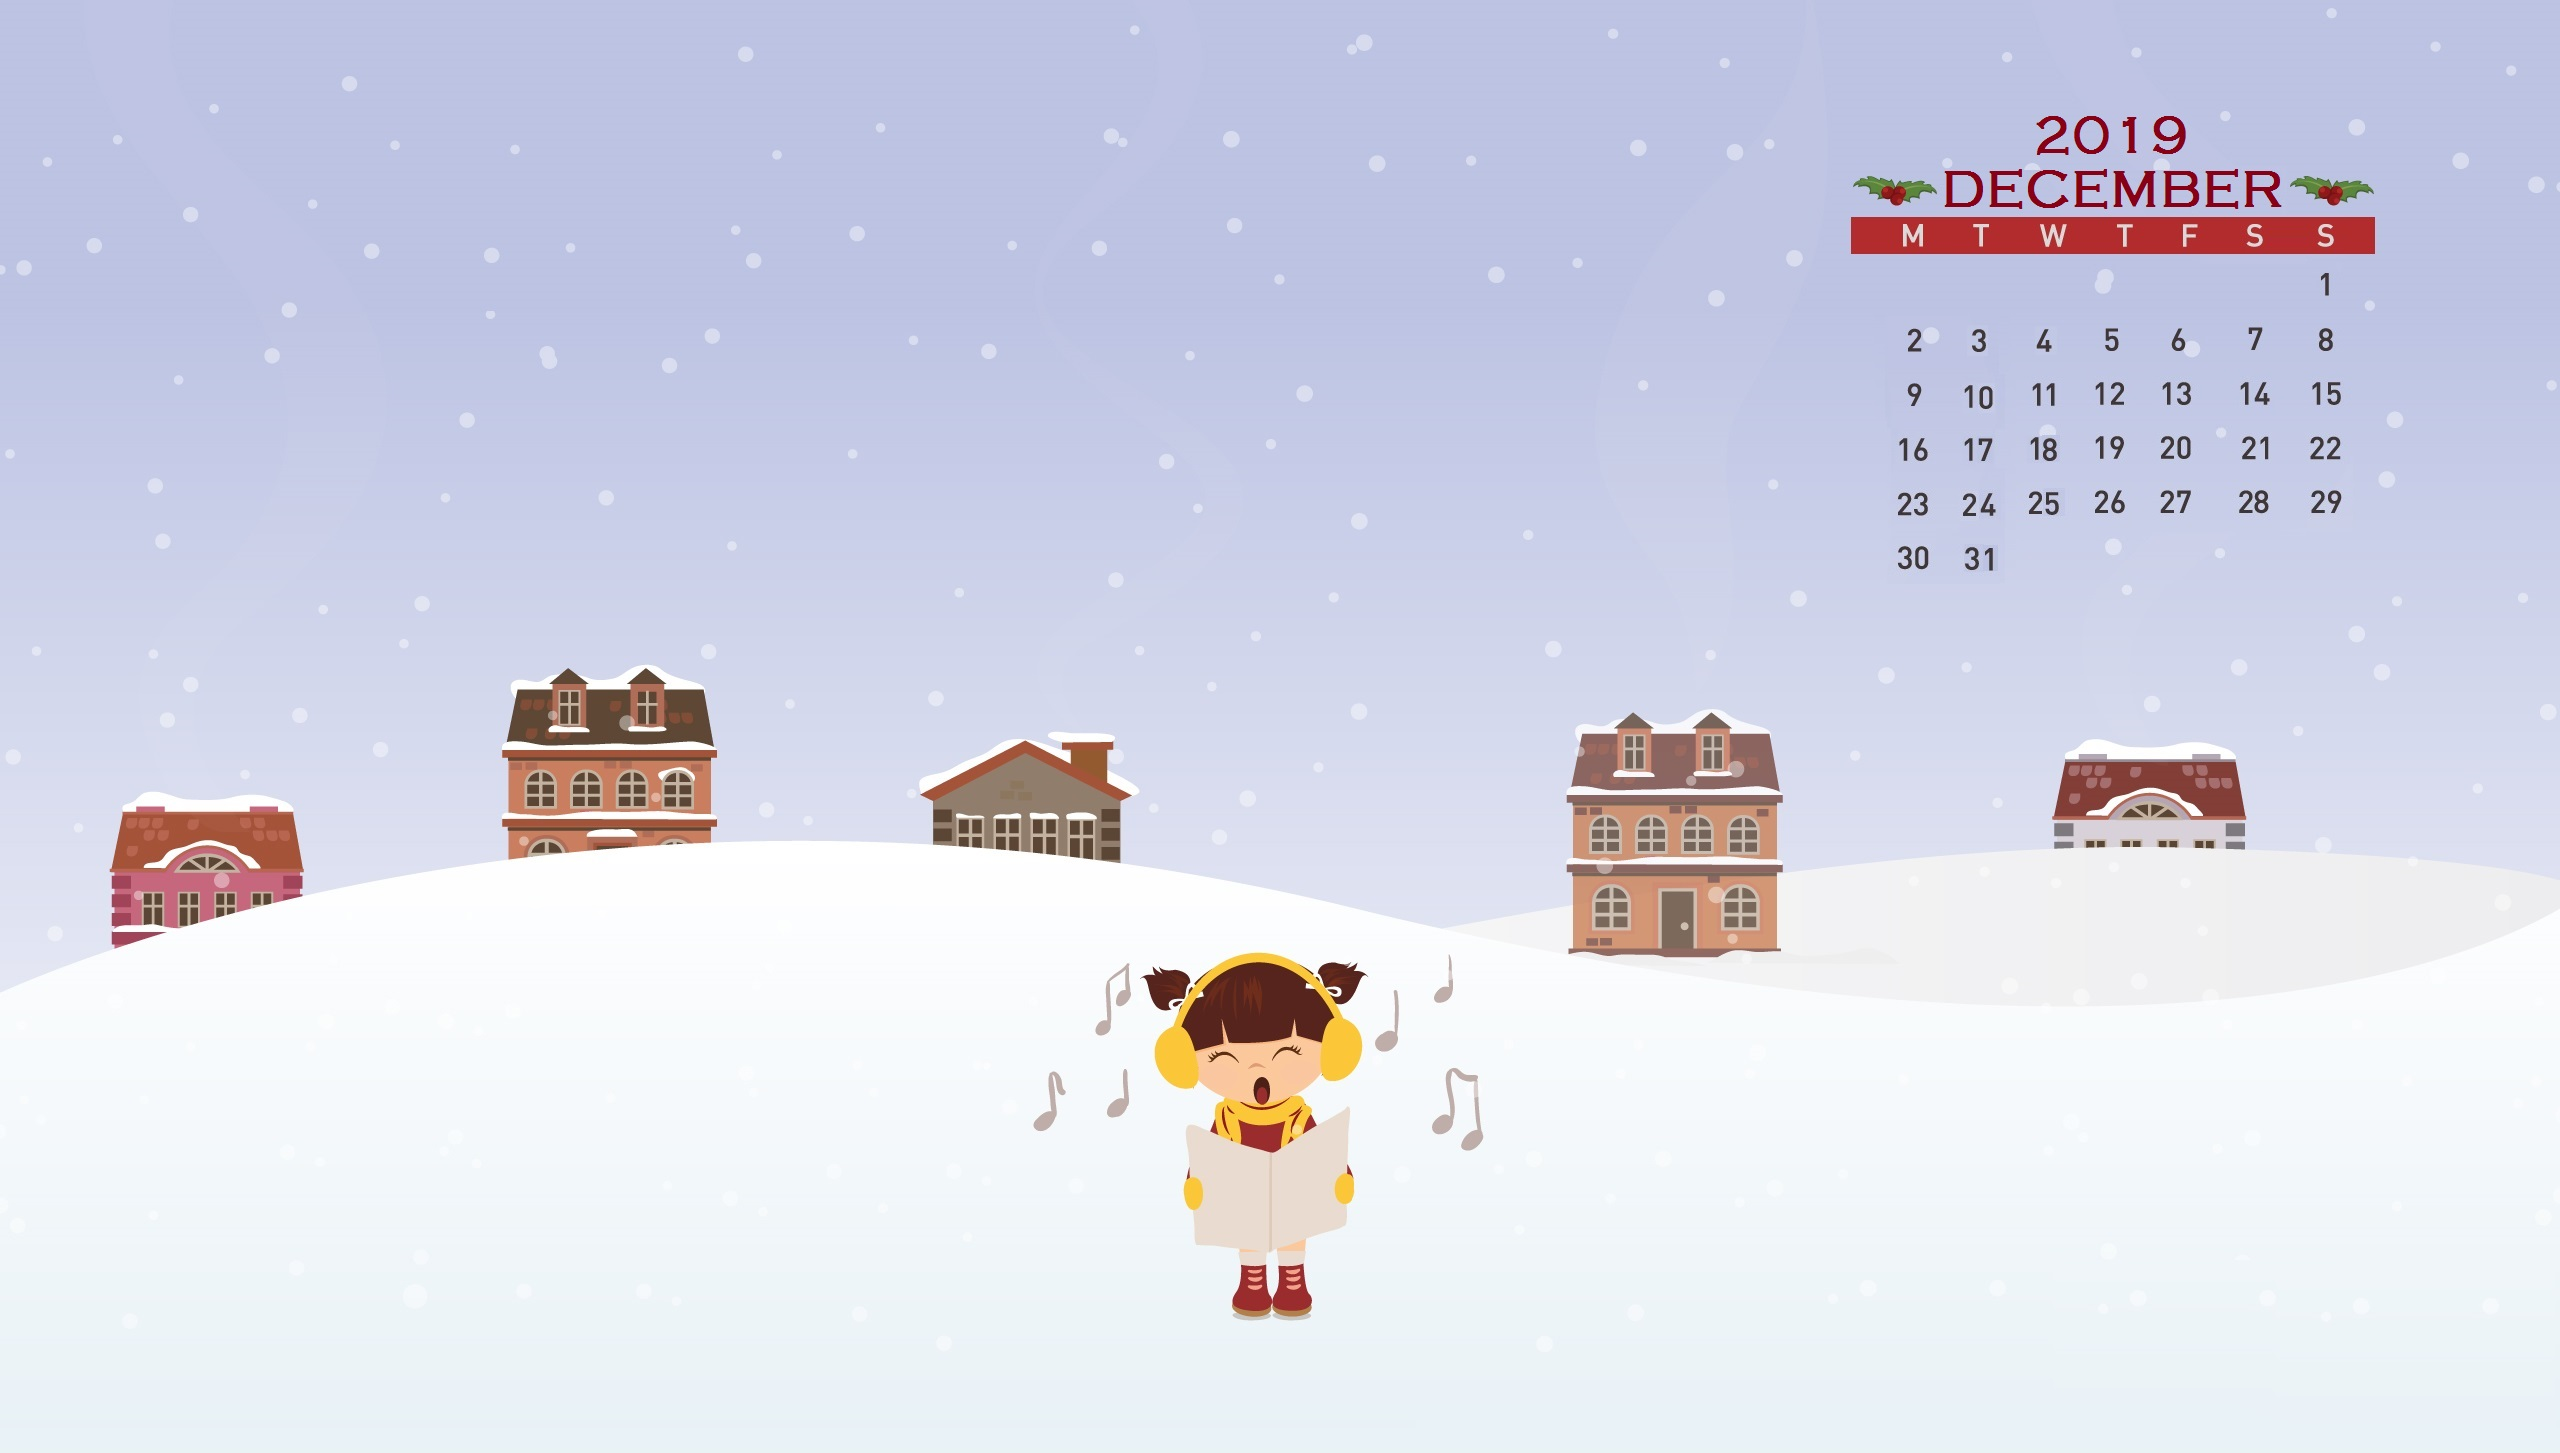 December 2019 Calendar Screensaver